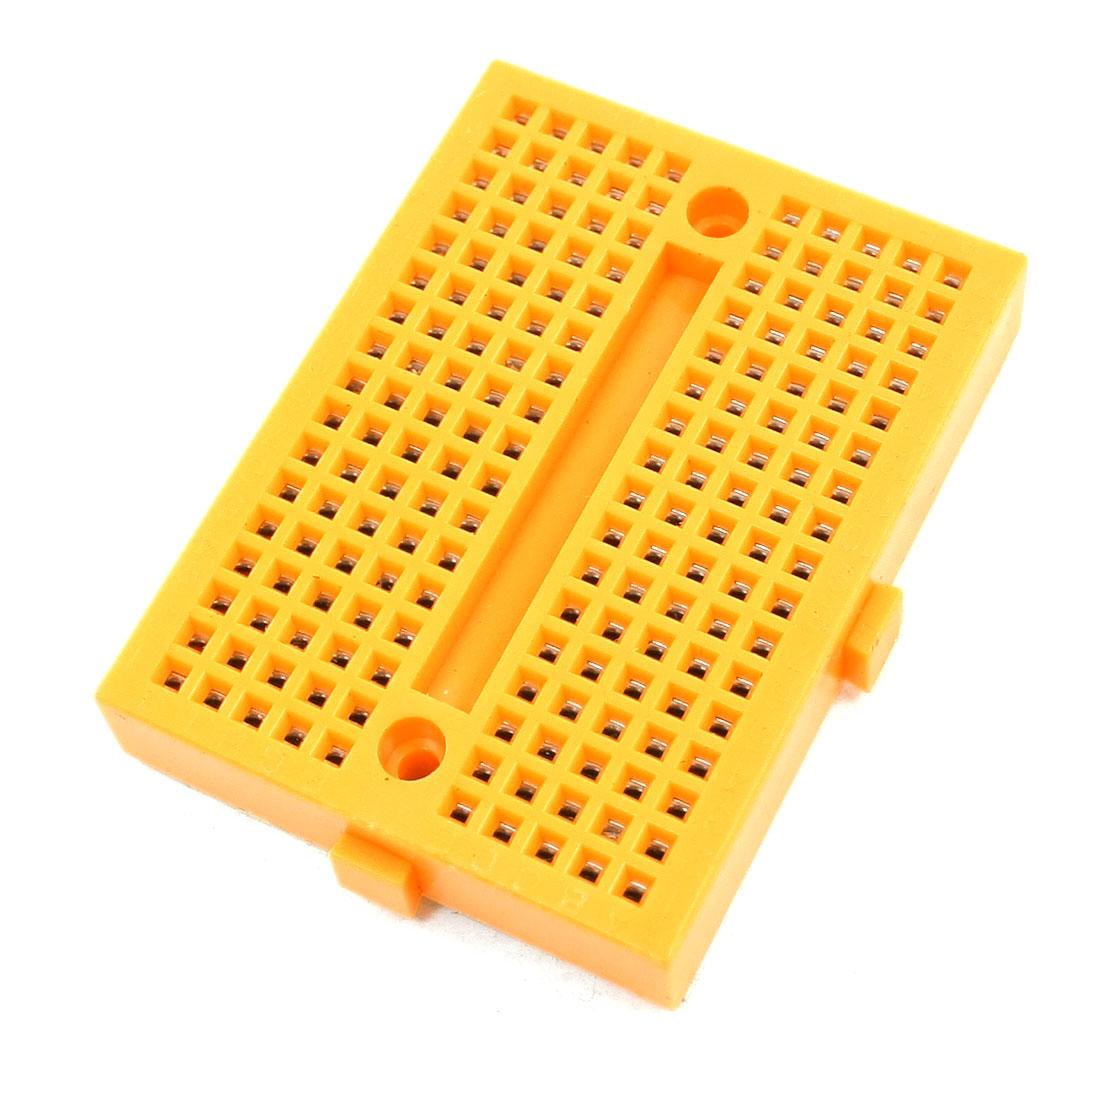 DIY Solderless Breadboard 170 Tie Point PCB Panel 47x35x9mm Yellow